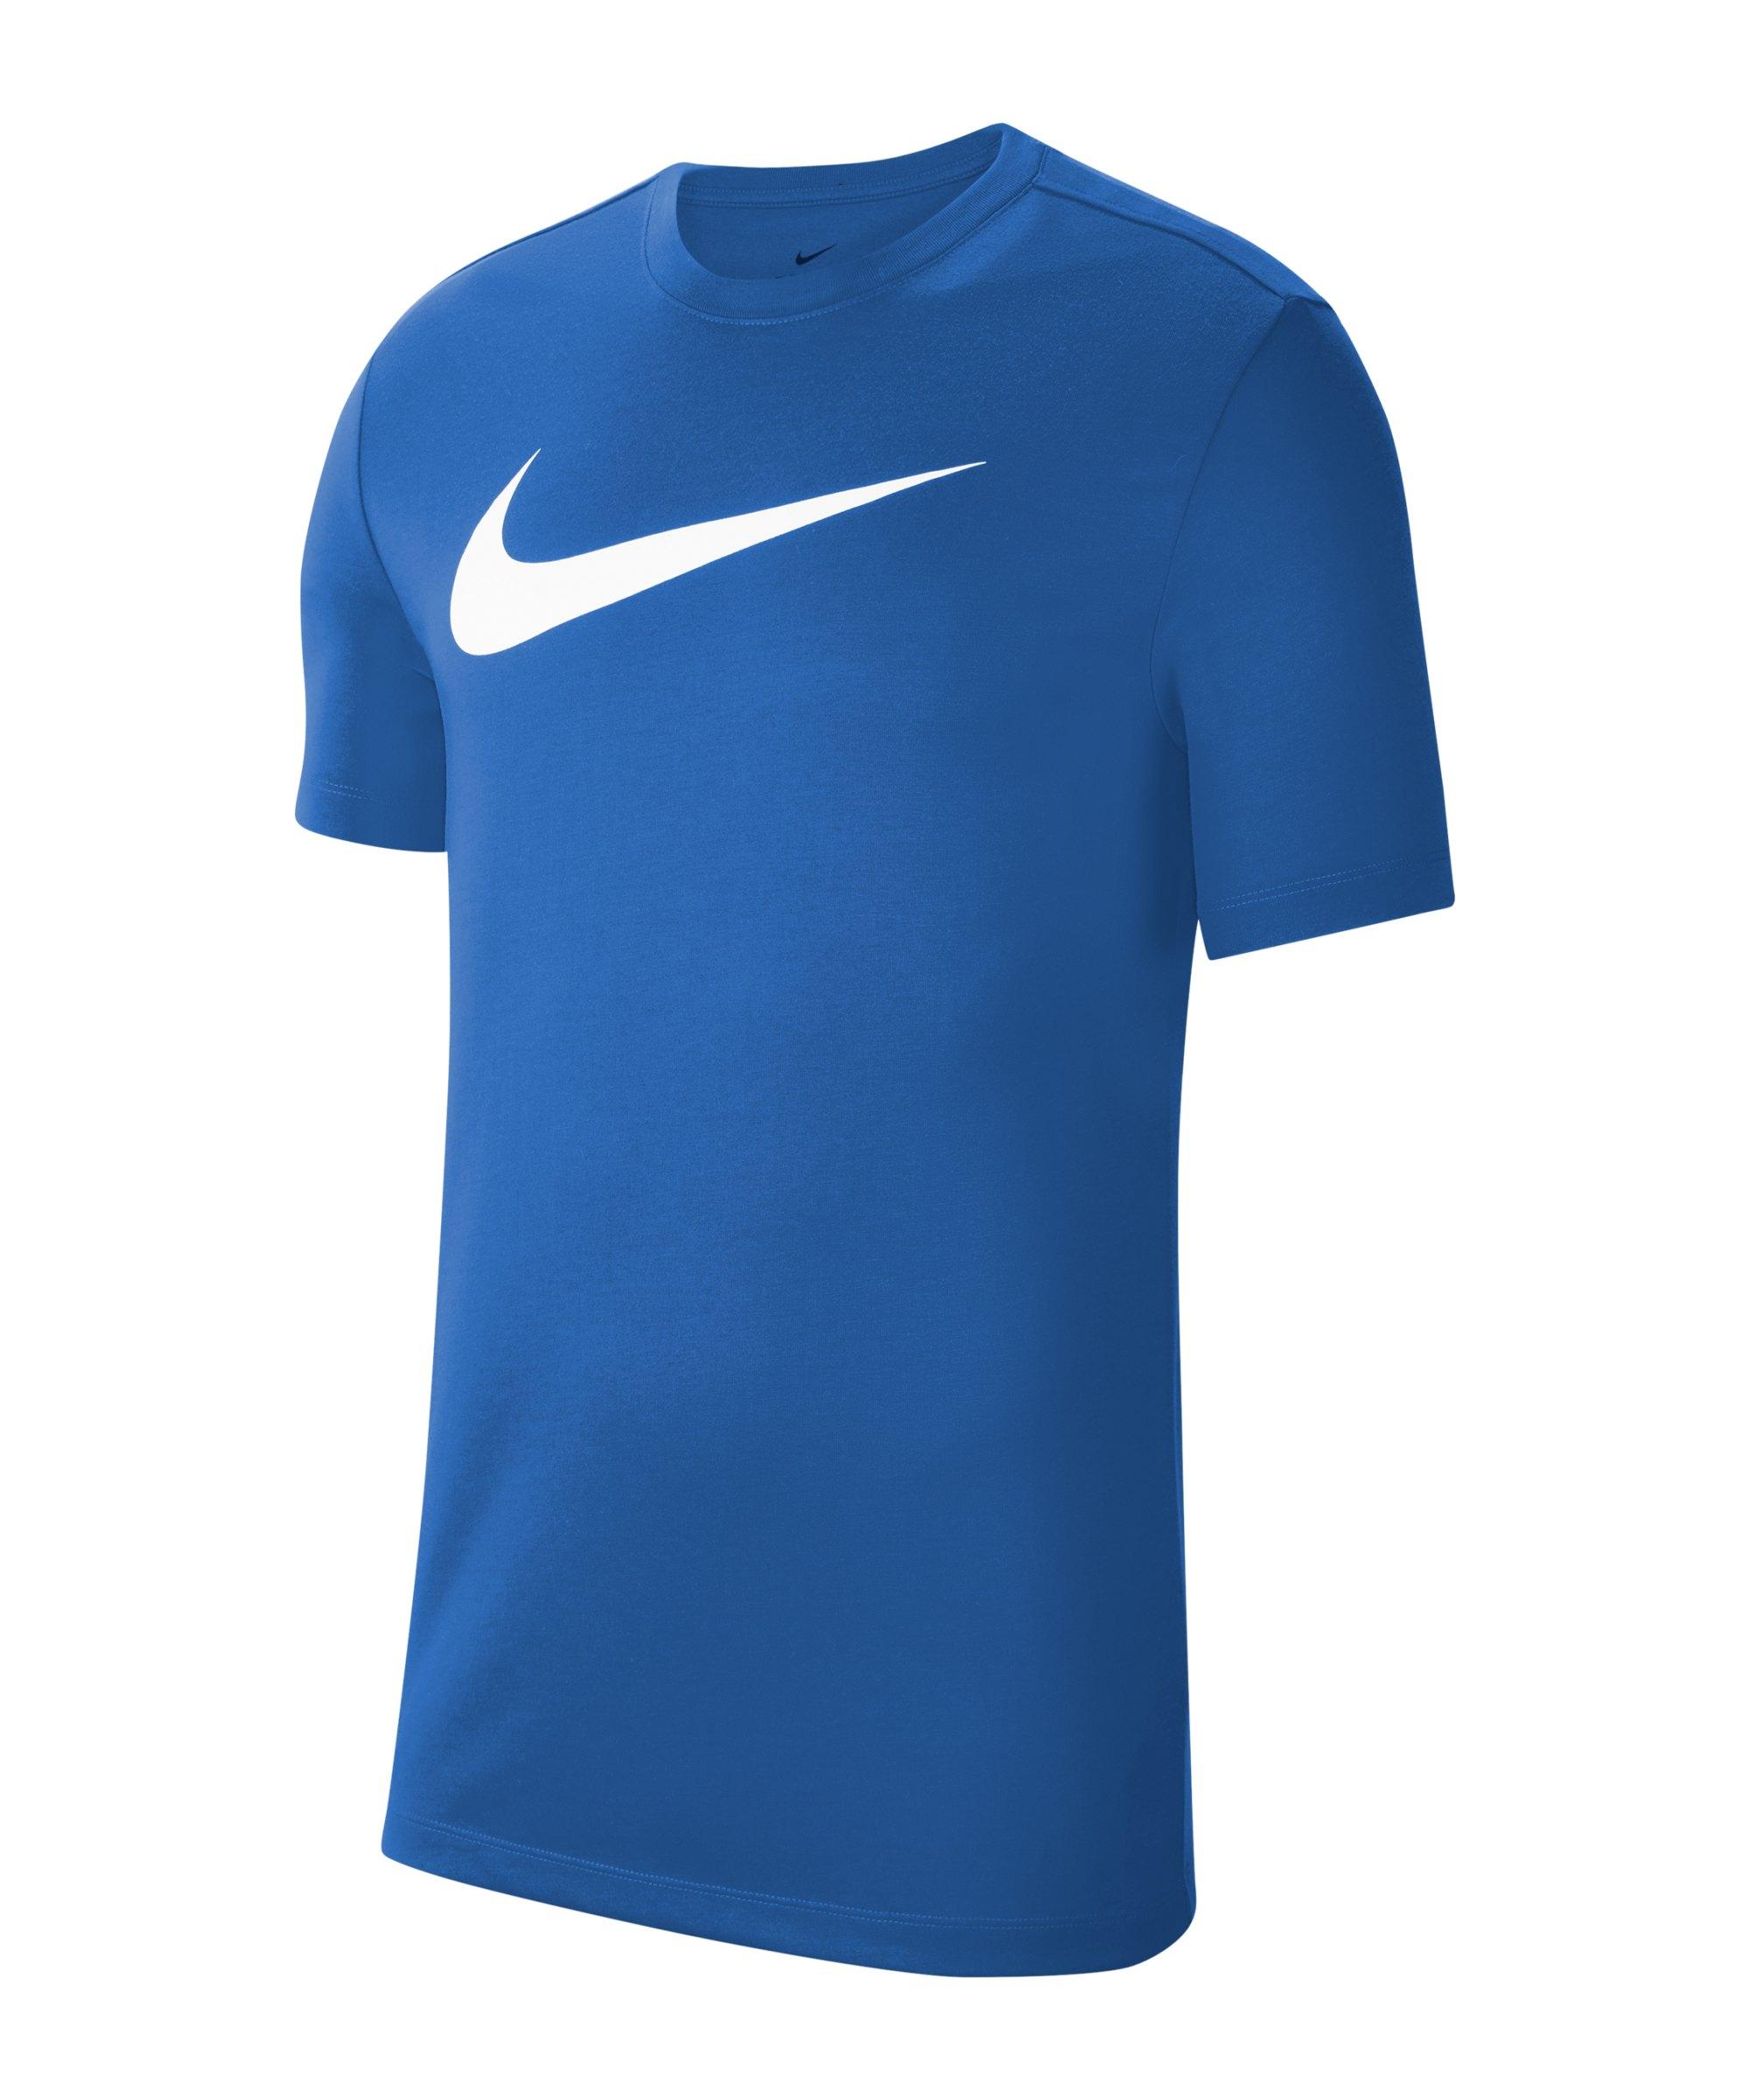 Nike Park 20 T-Shirt Swoosh Blau Weiss F463 - blau